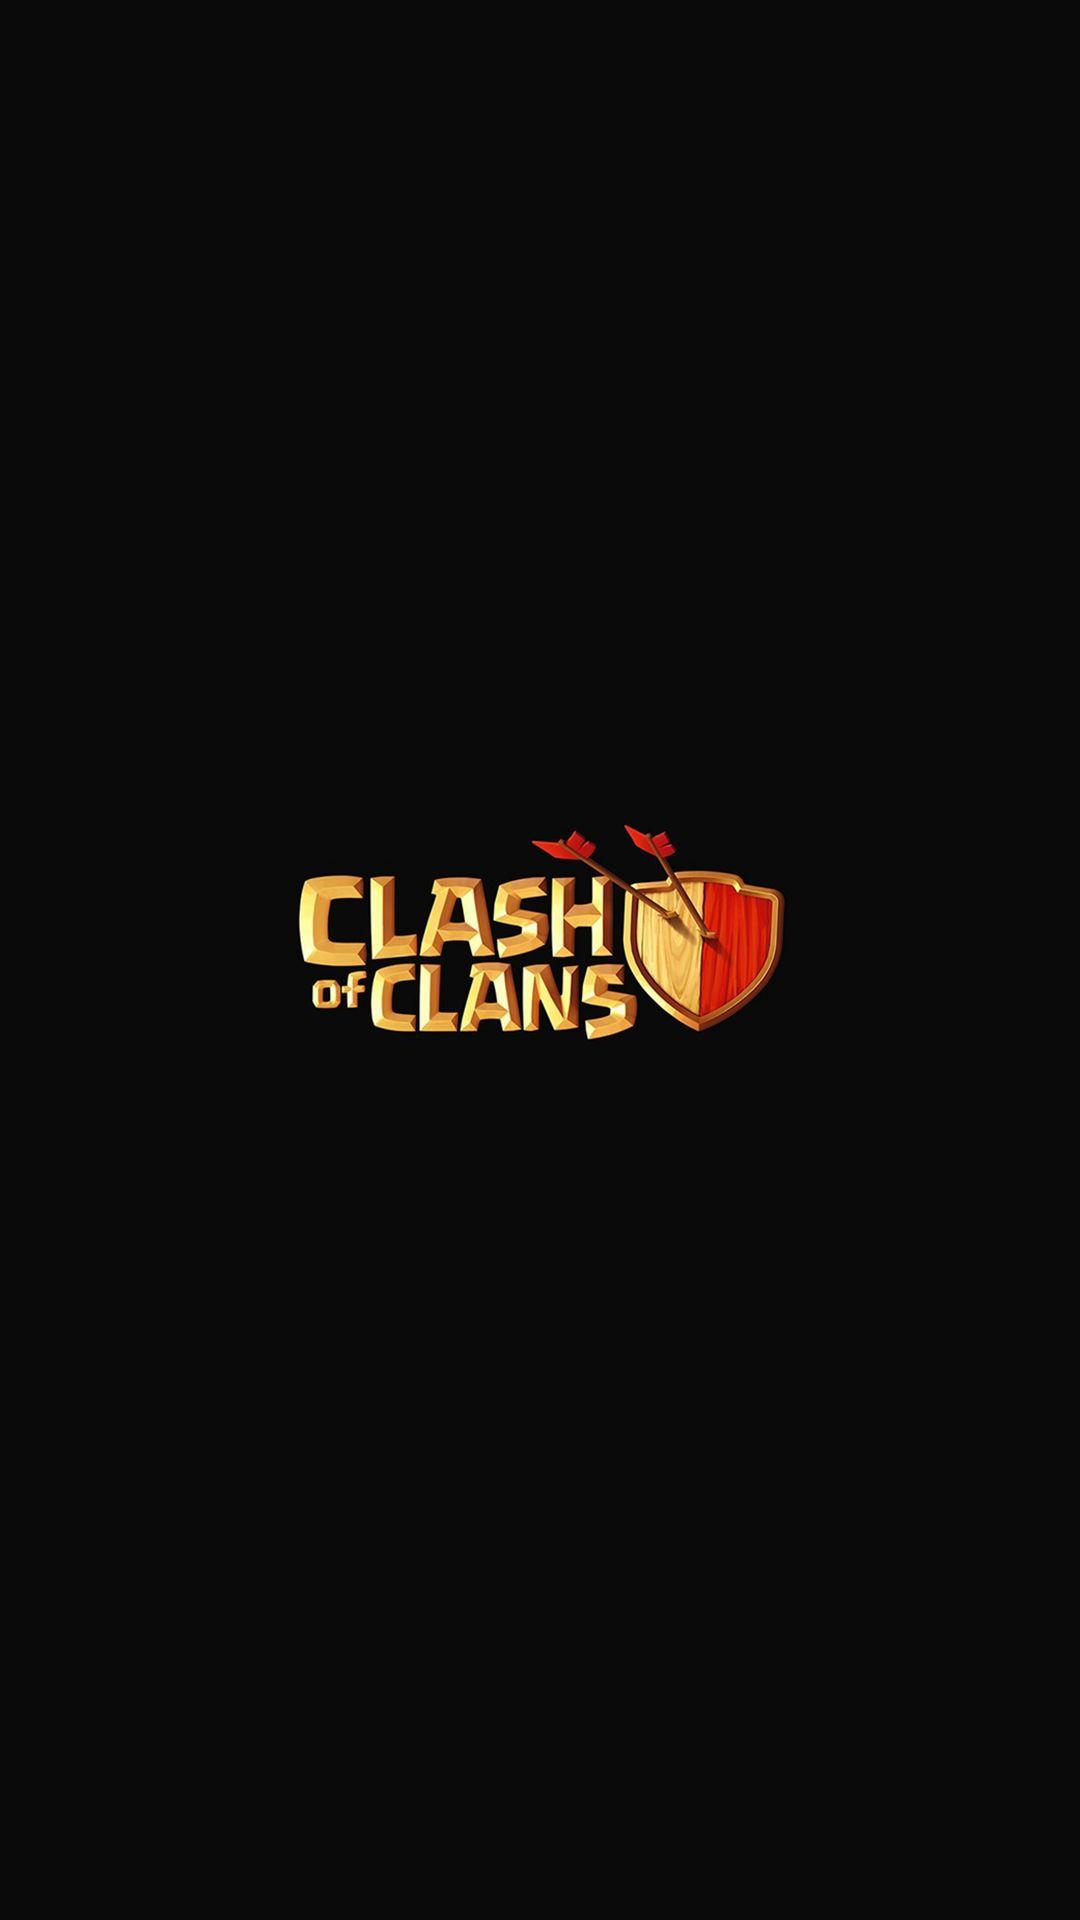 Clash Of Clans Logo Art Dark Game Iphone 6 Plus Wallpaper